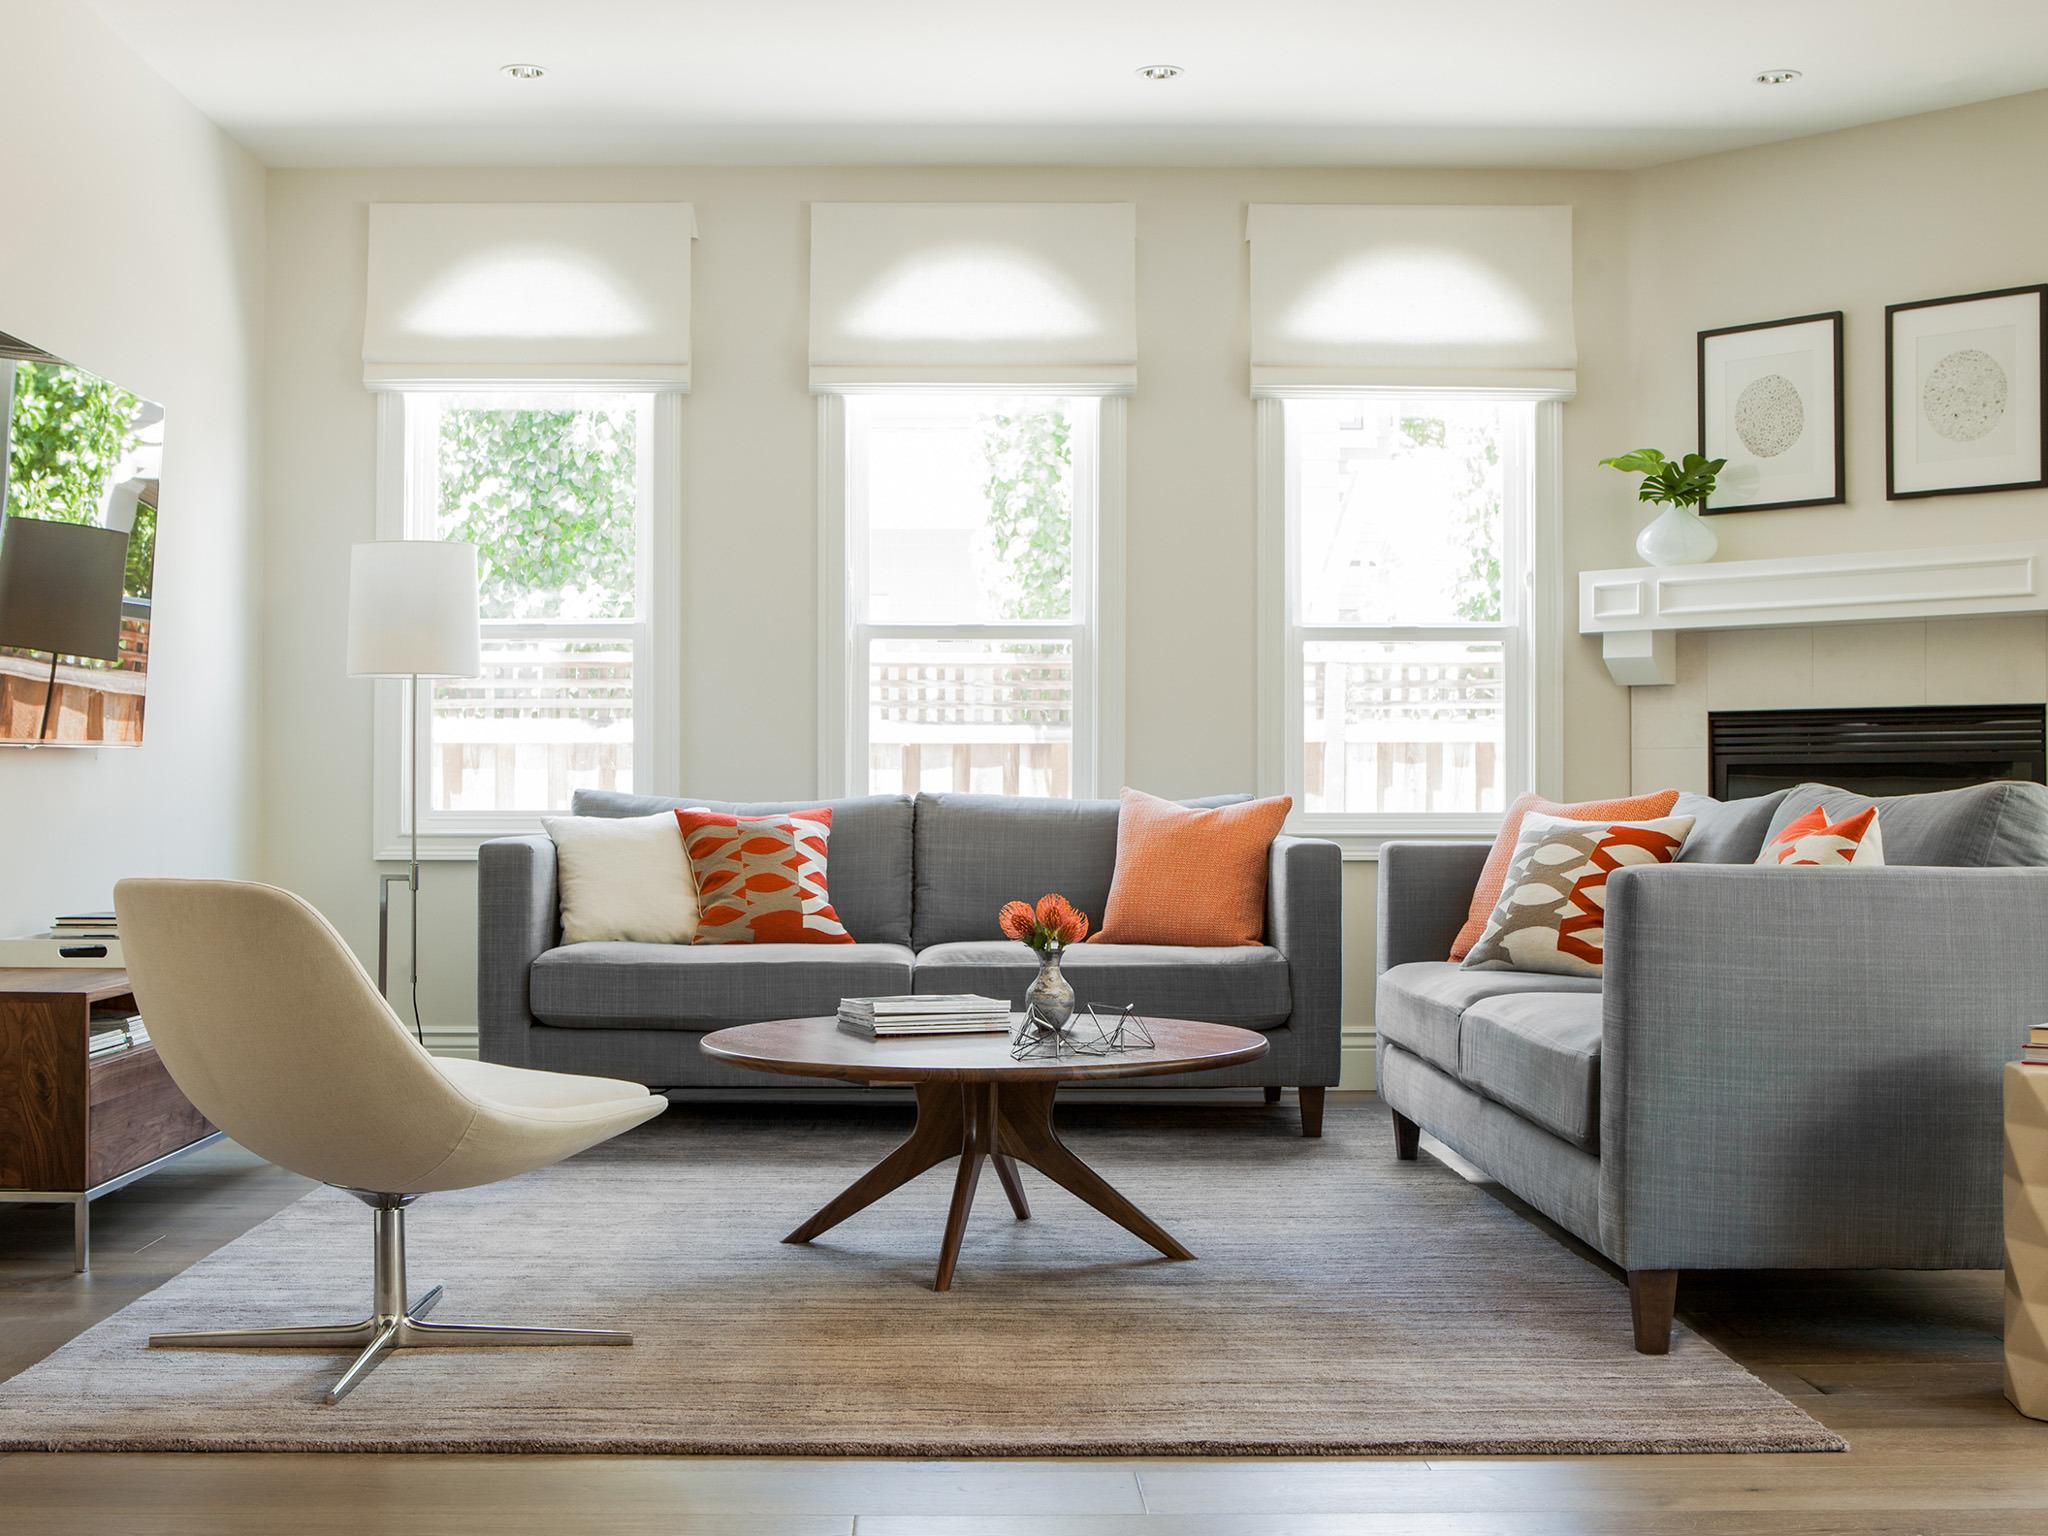 Interior Design for Living Rooms Sitting Room Ideas   Roy Home Design